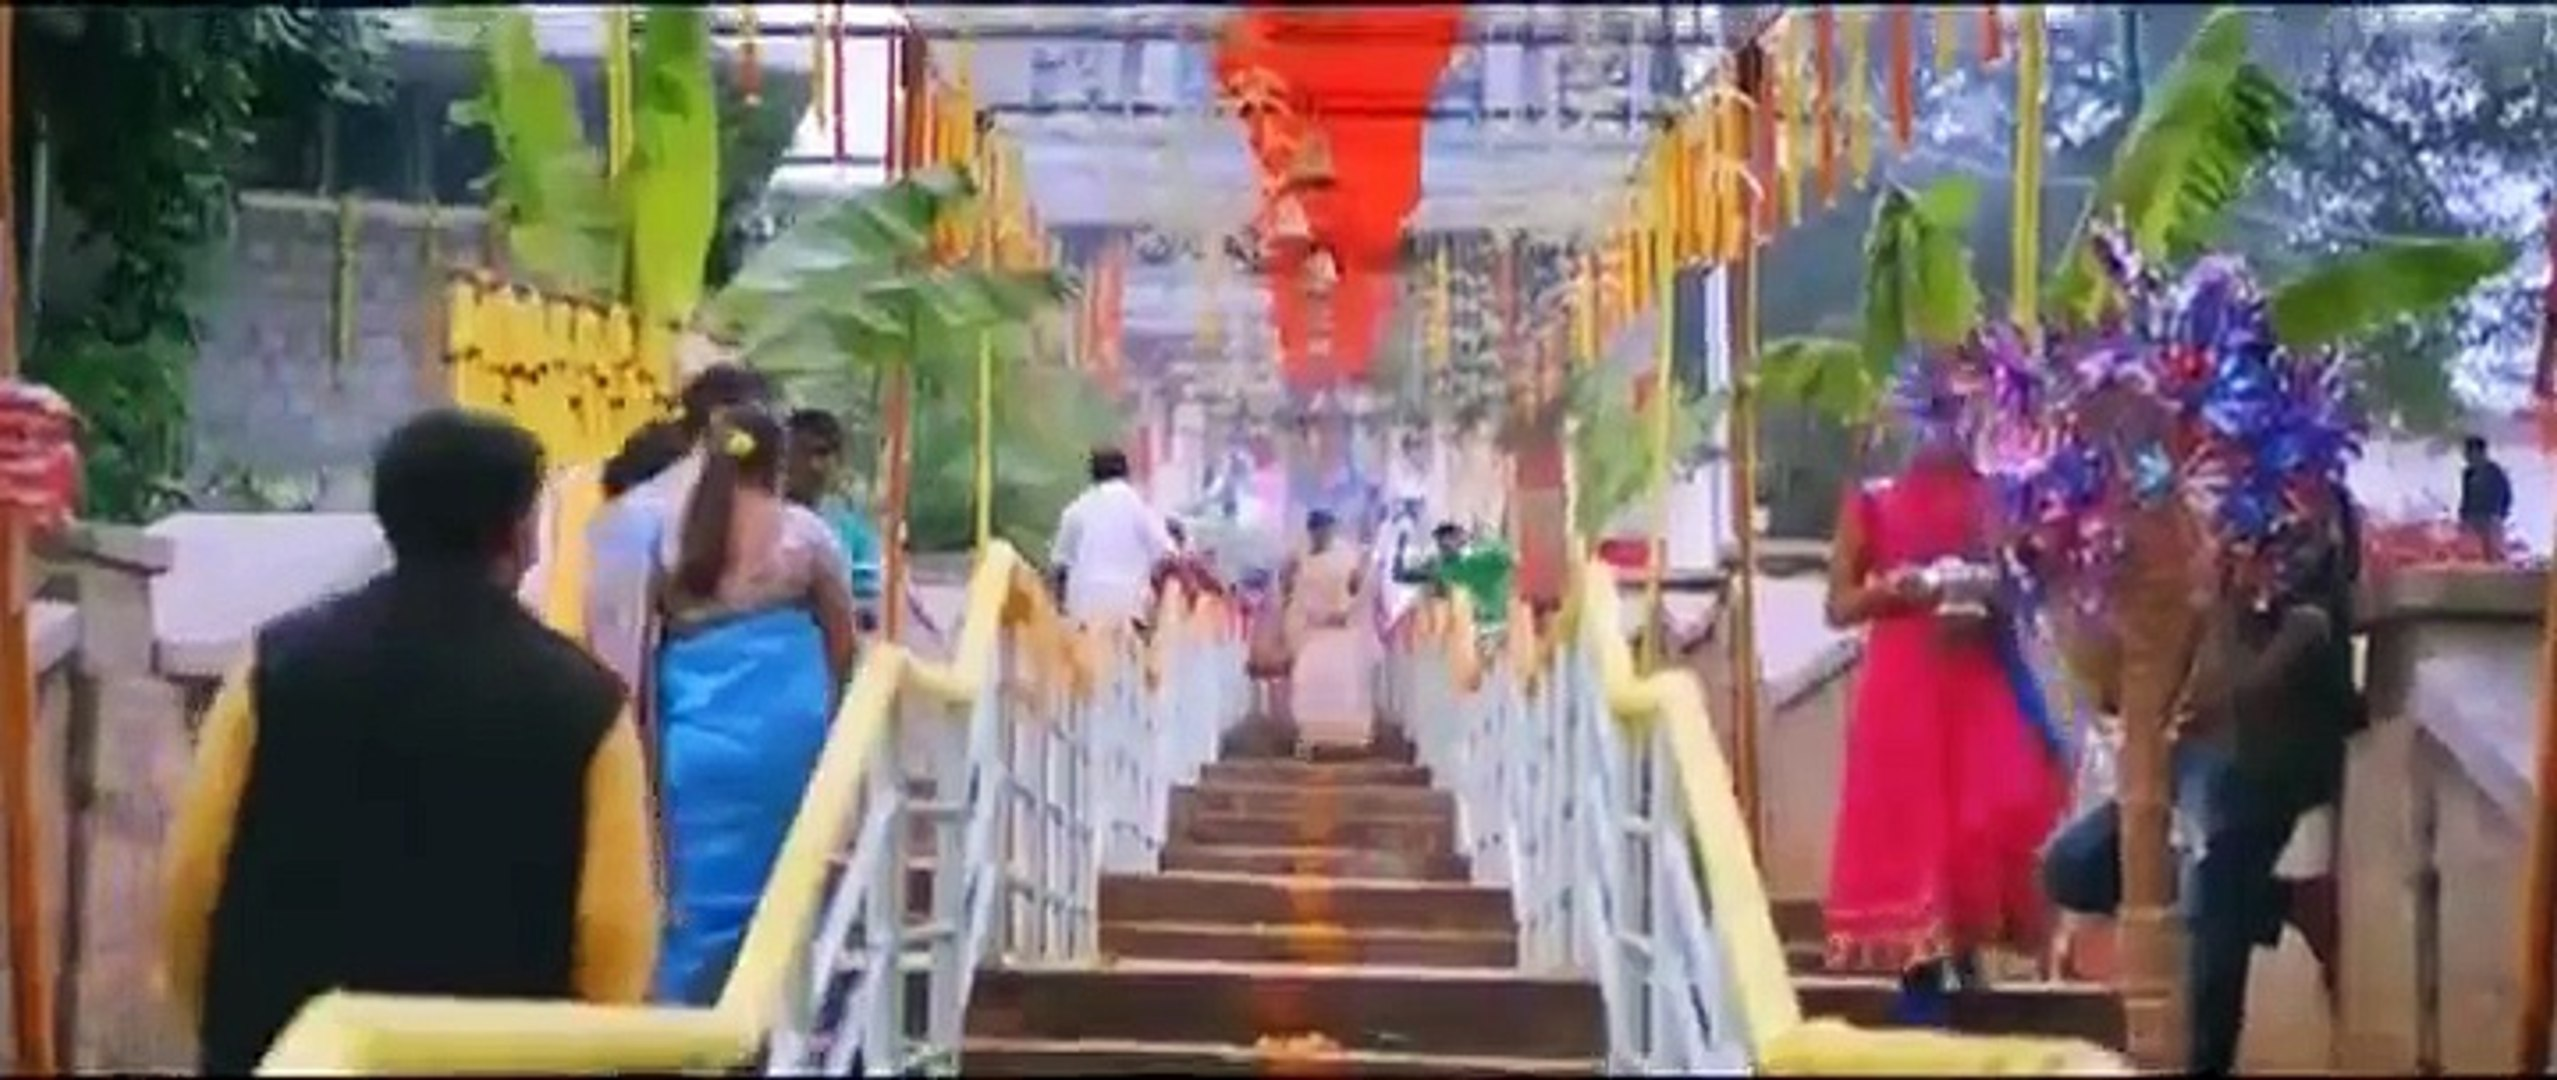 South indian hindi movie 2018  'bharjari '  part - 1.  full movie, Bharjari hindi dubbed m